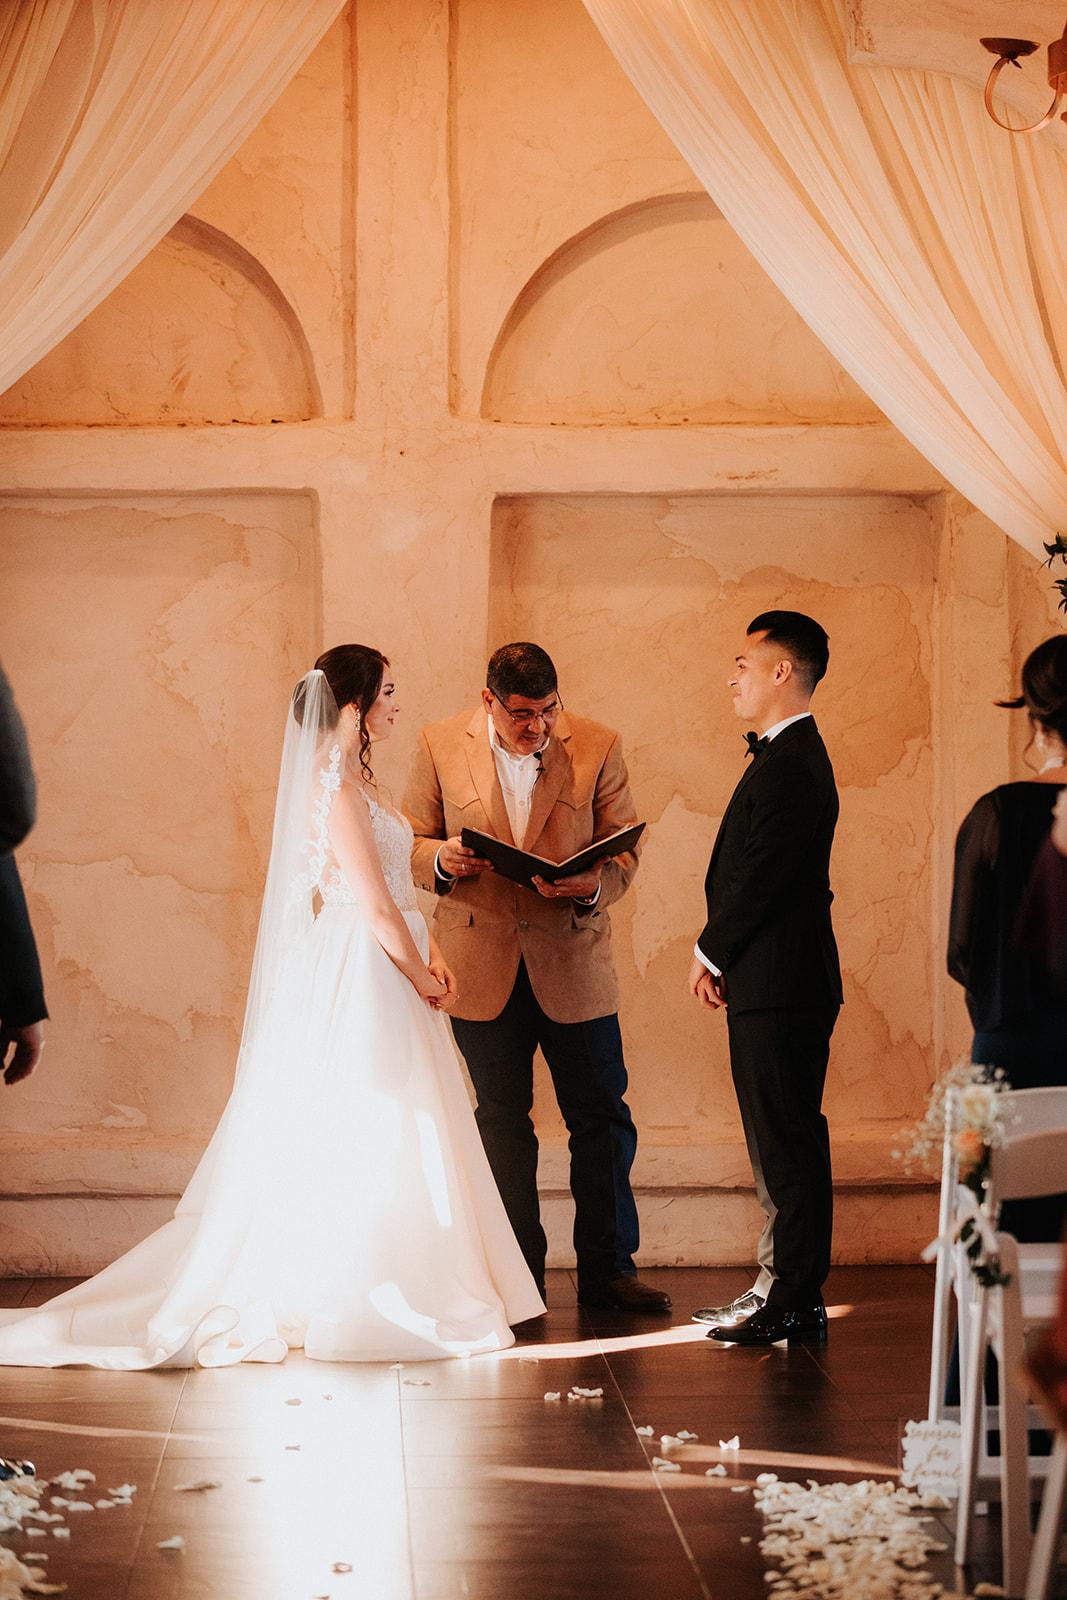 Jessica_+_JD_Wedding_-_Diana_Ascarrunz_Photography-417.jpg